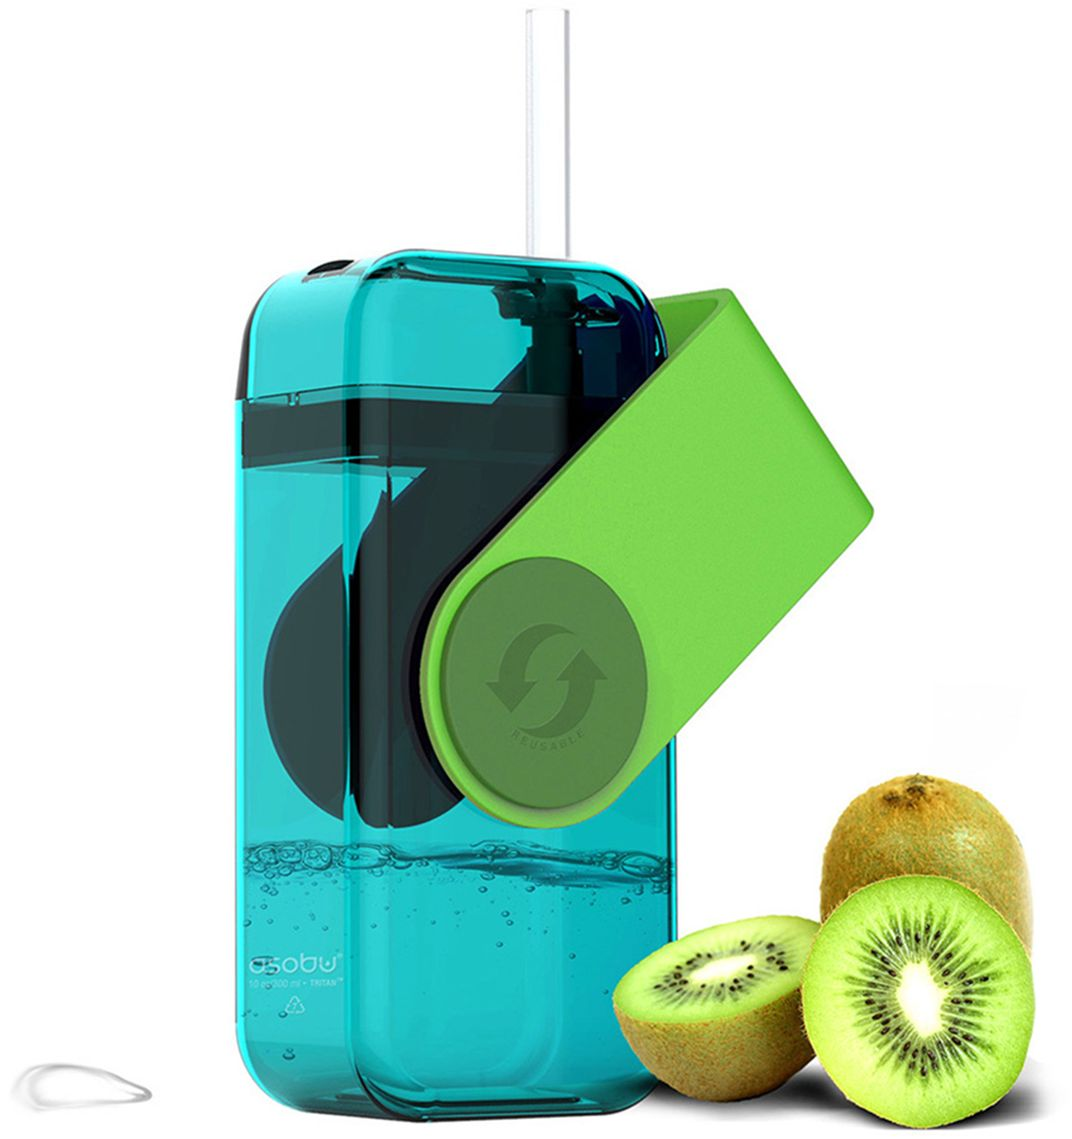 Бутылка Asobu Juicy drink box, цвет: зеленый, 290 мл бутылка asobu ice t 2 go цвет фиолетовый 400 мл